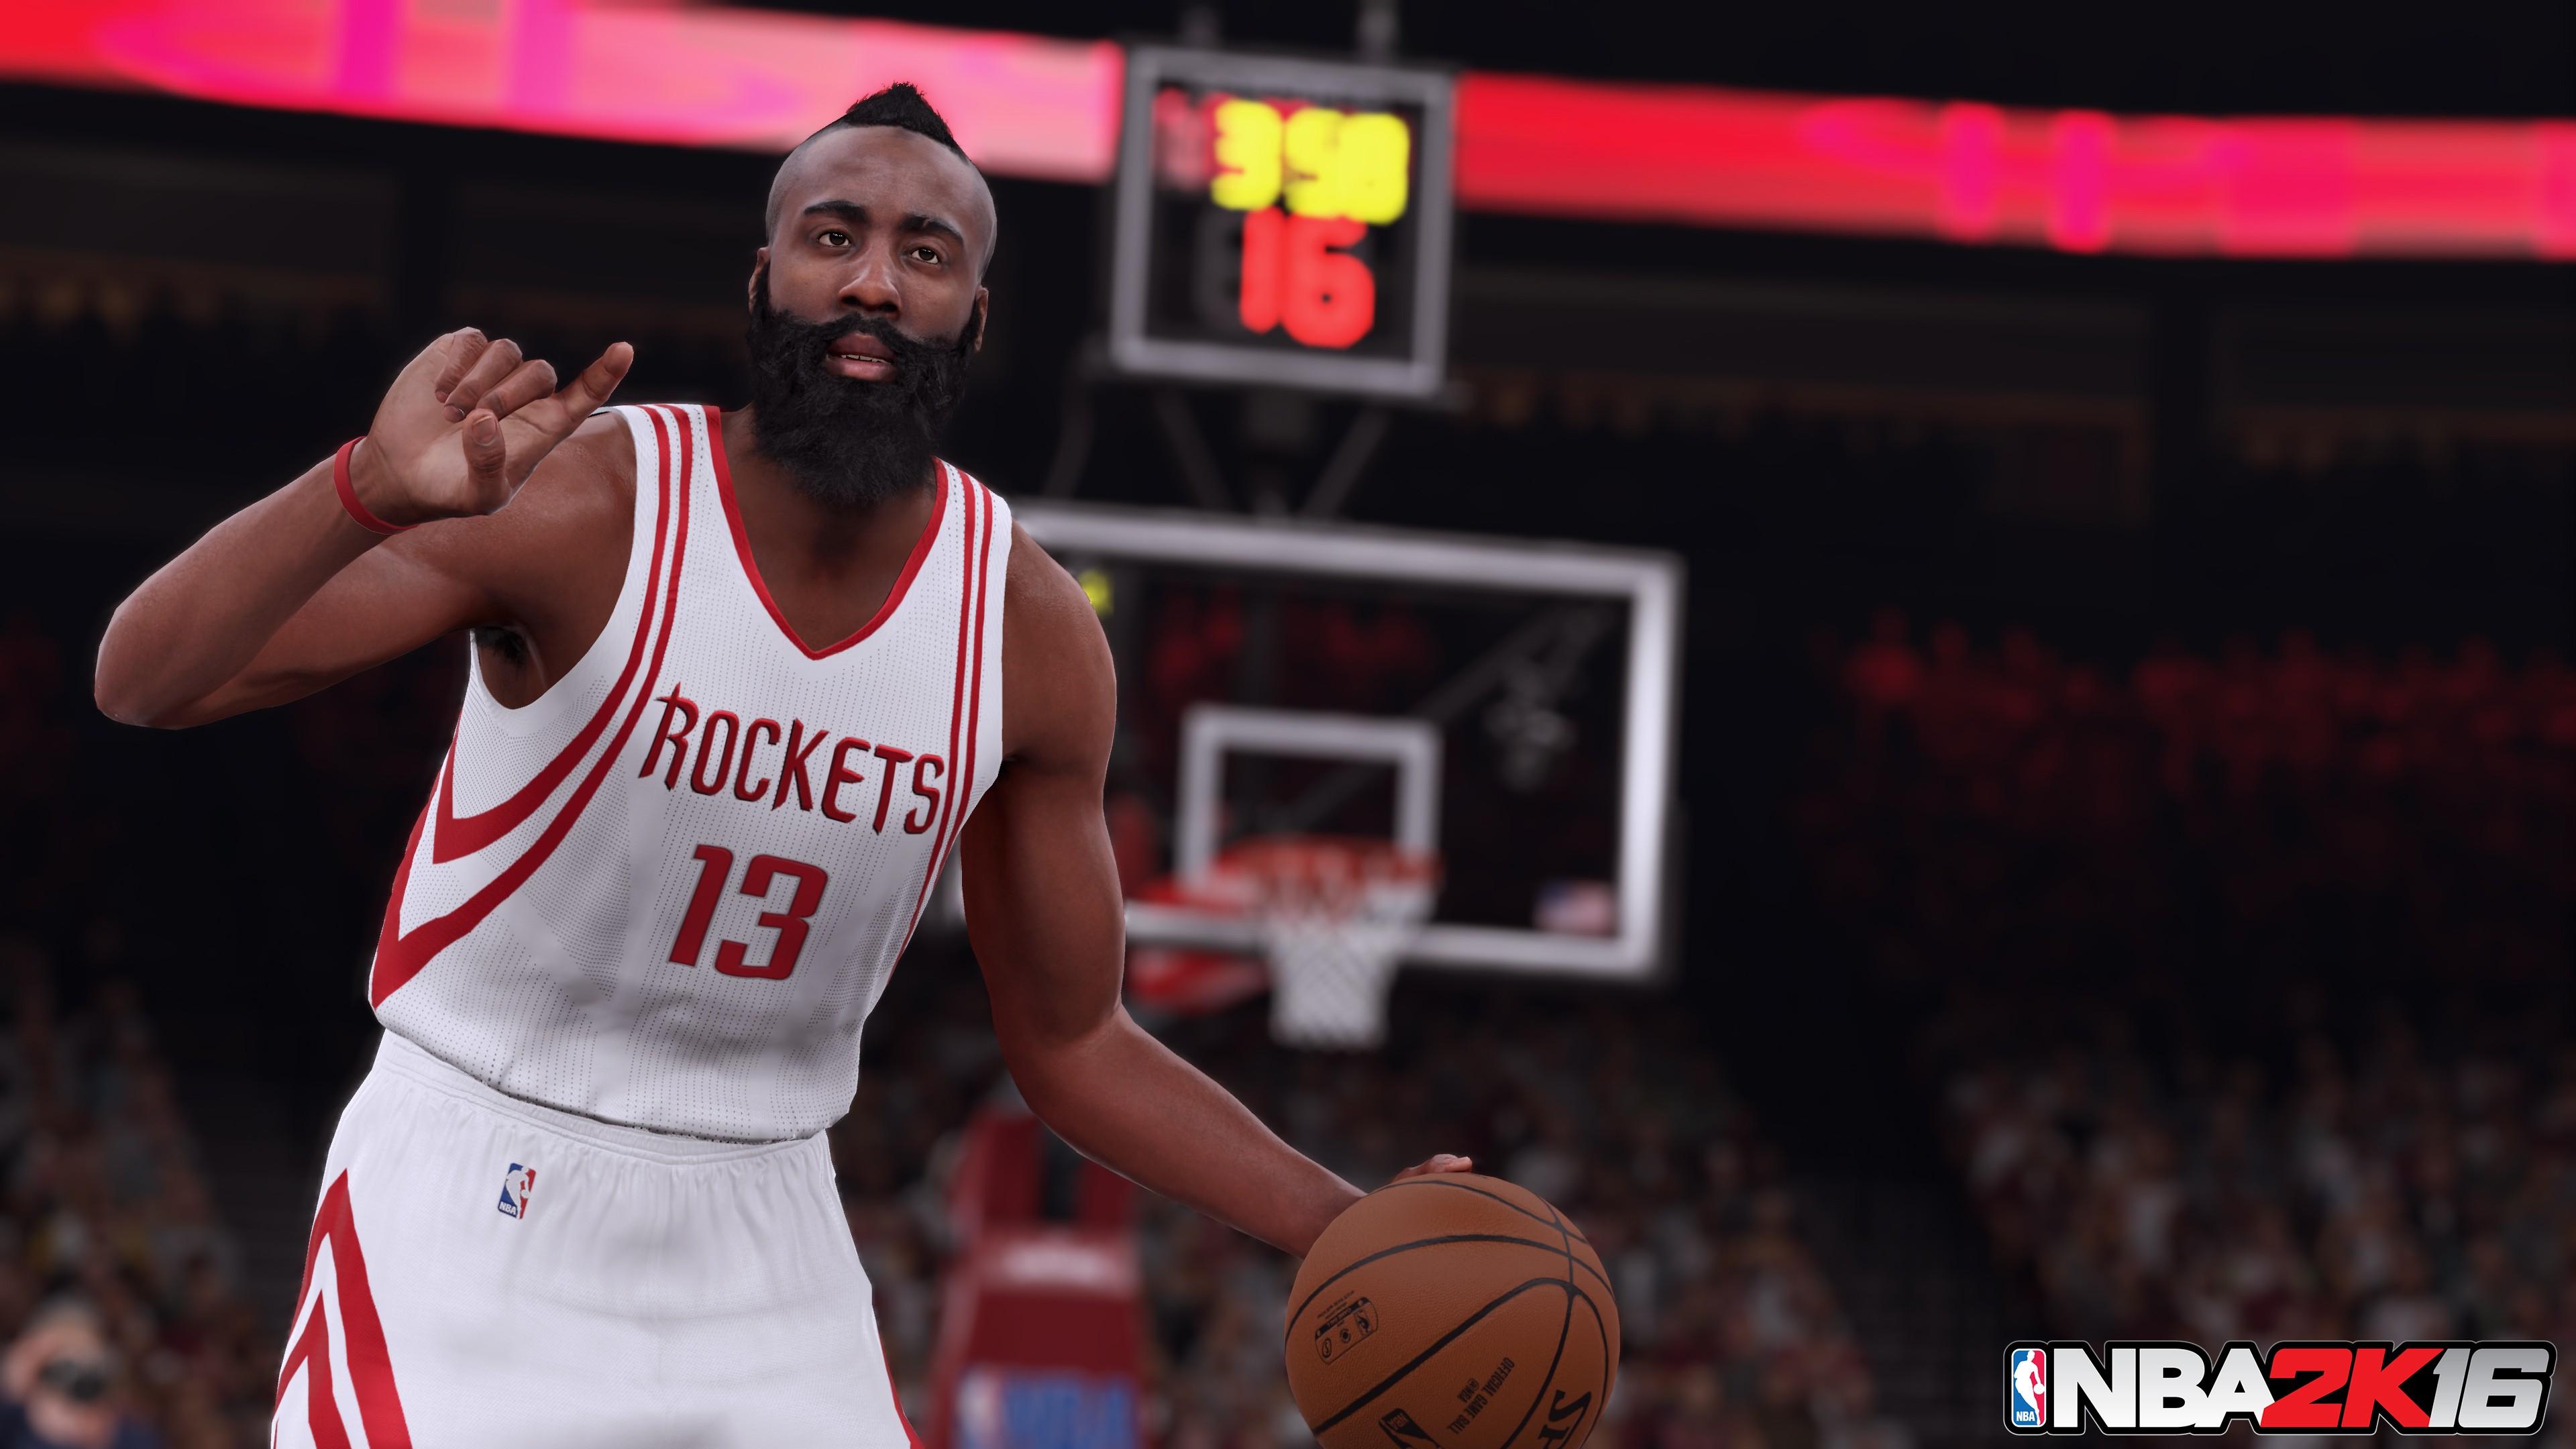 NBA2K16 Stephen Curry James Harden Anthony Davis